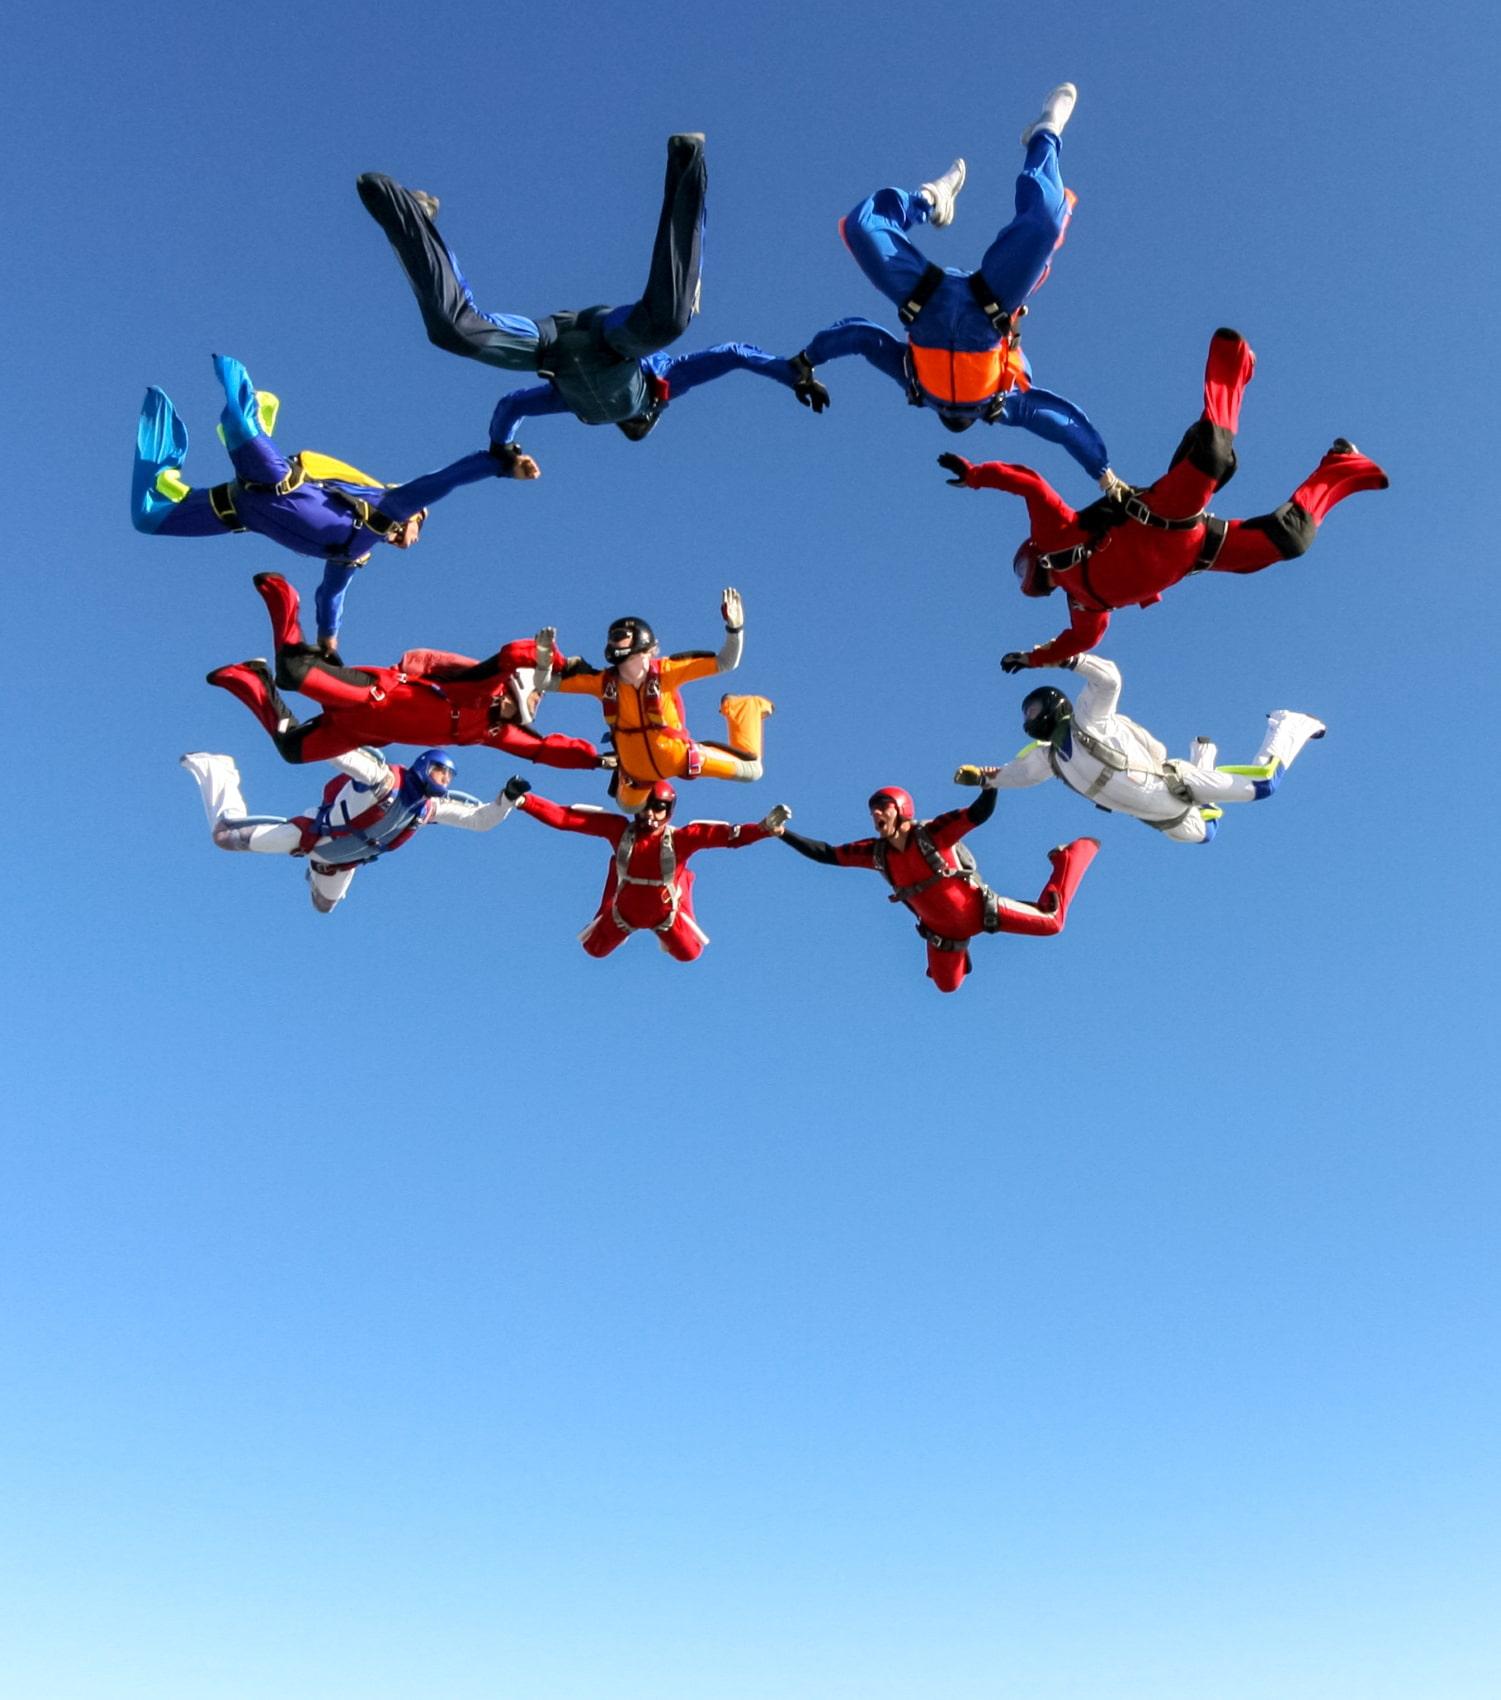 Skydiver als Team